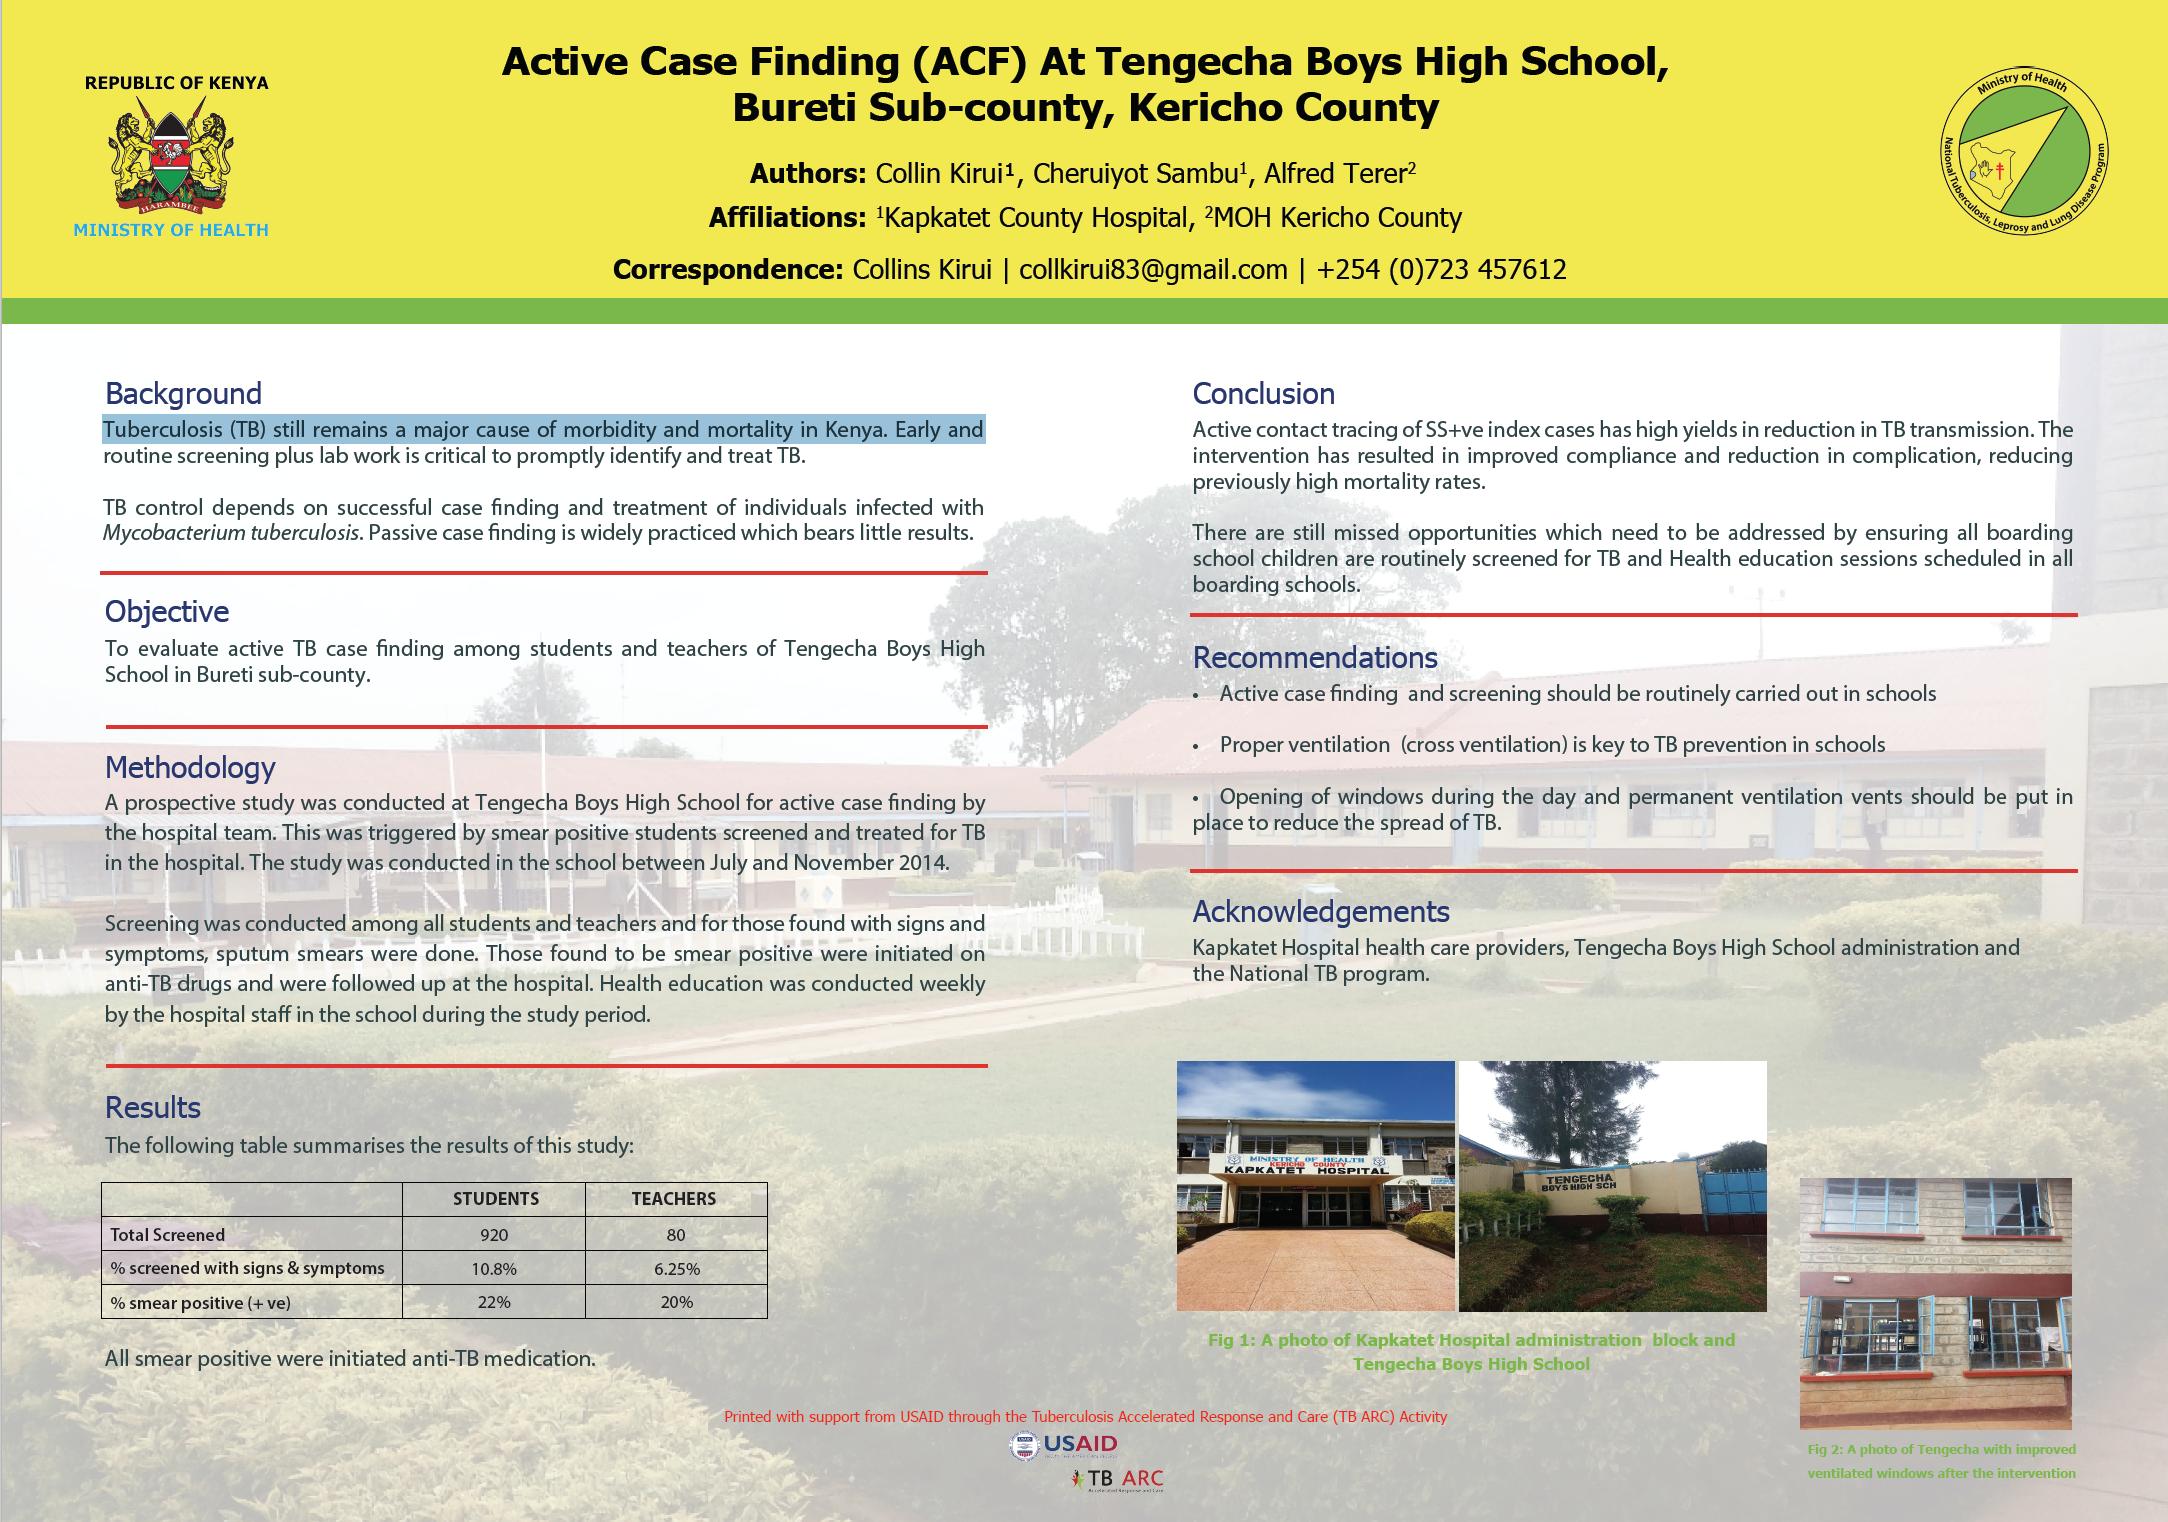 Active Case Finding at Tengecha Boys High School , Bureti Sub-county, Kericho County